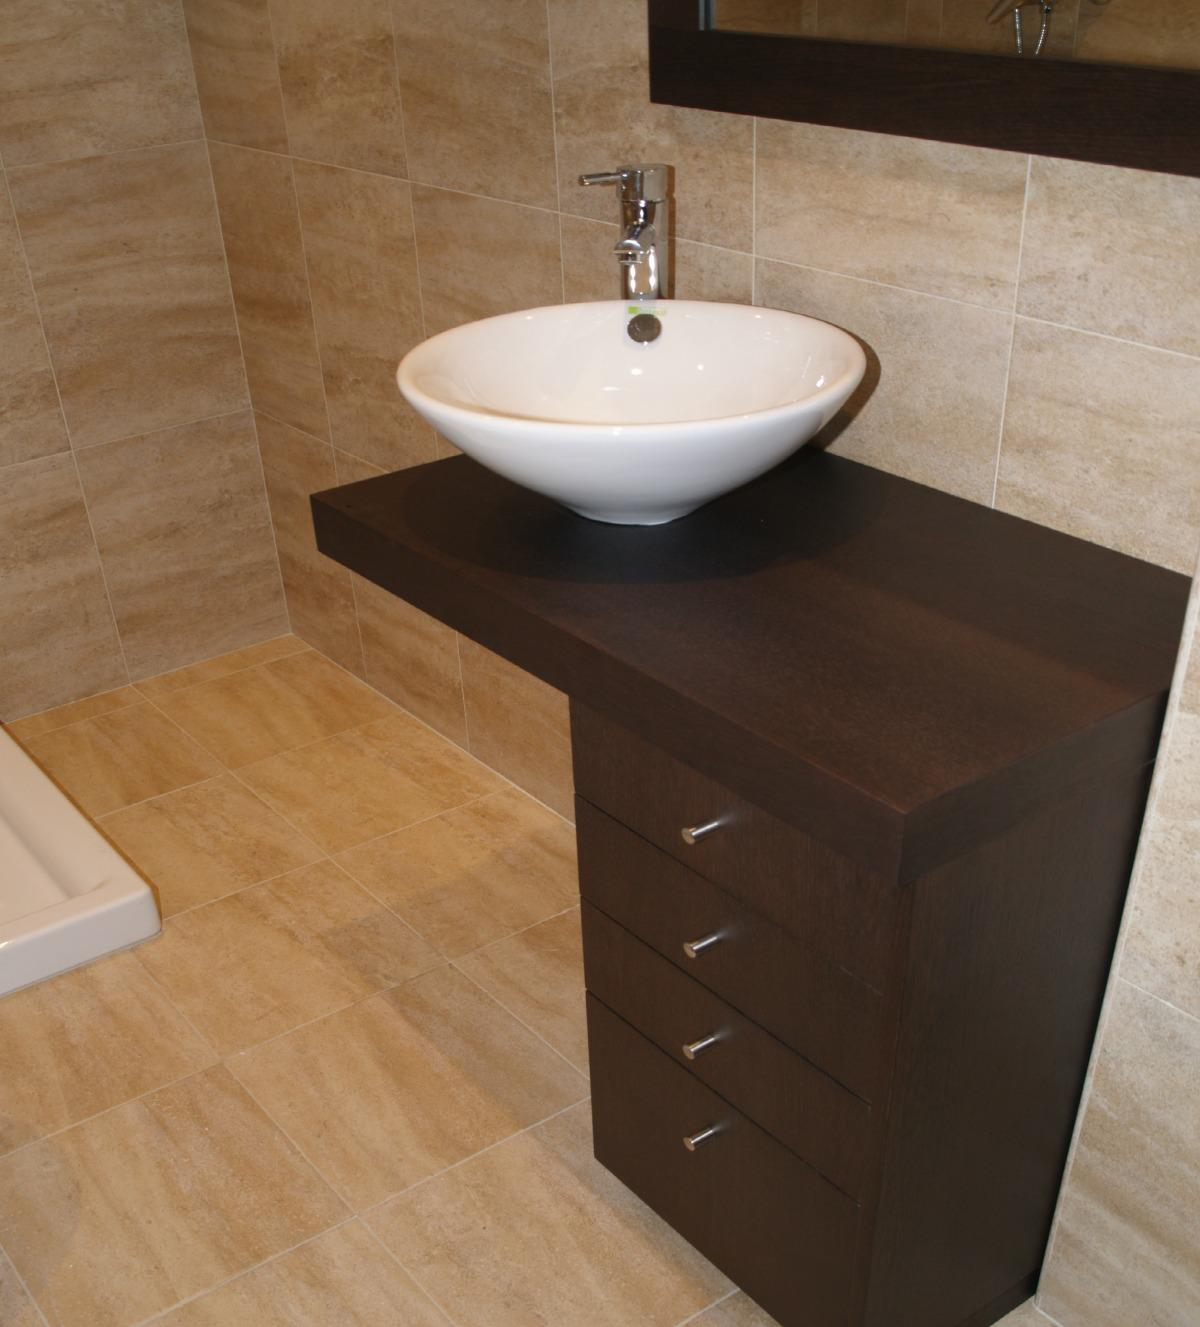 Muebles de ba o en wengue a medida vetta grupo for Muebles de bano en madera natural